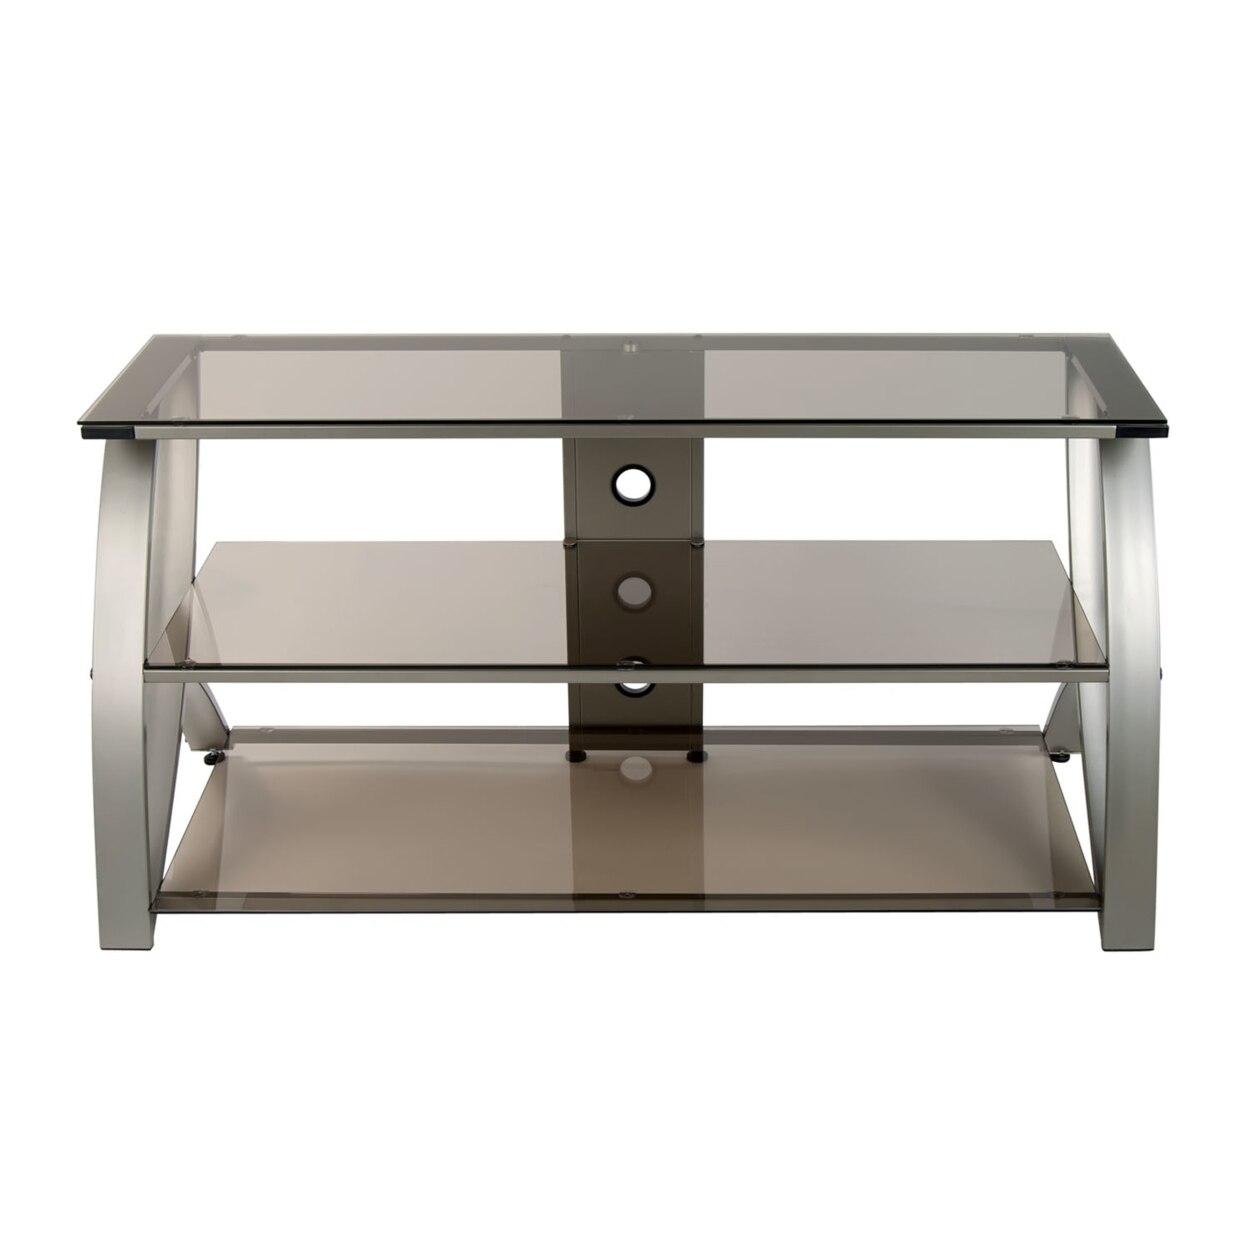 купить Offex Home Office Futura Advanced TV Stand Glass - Champagne/Bronze недорого